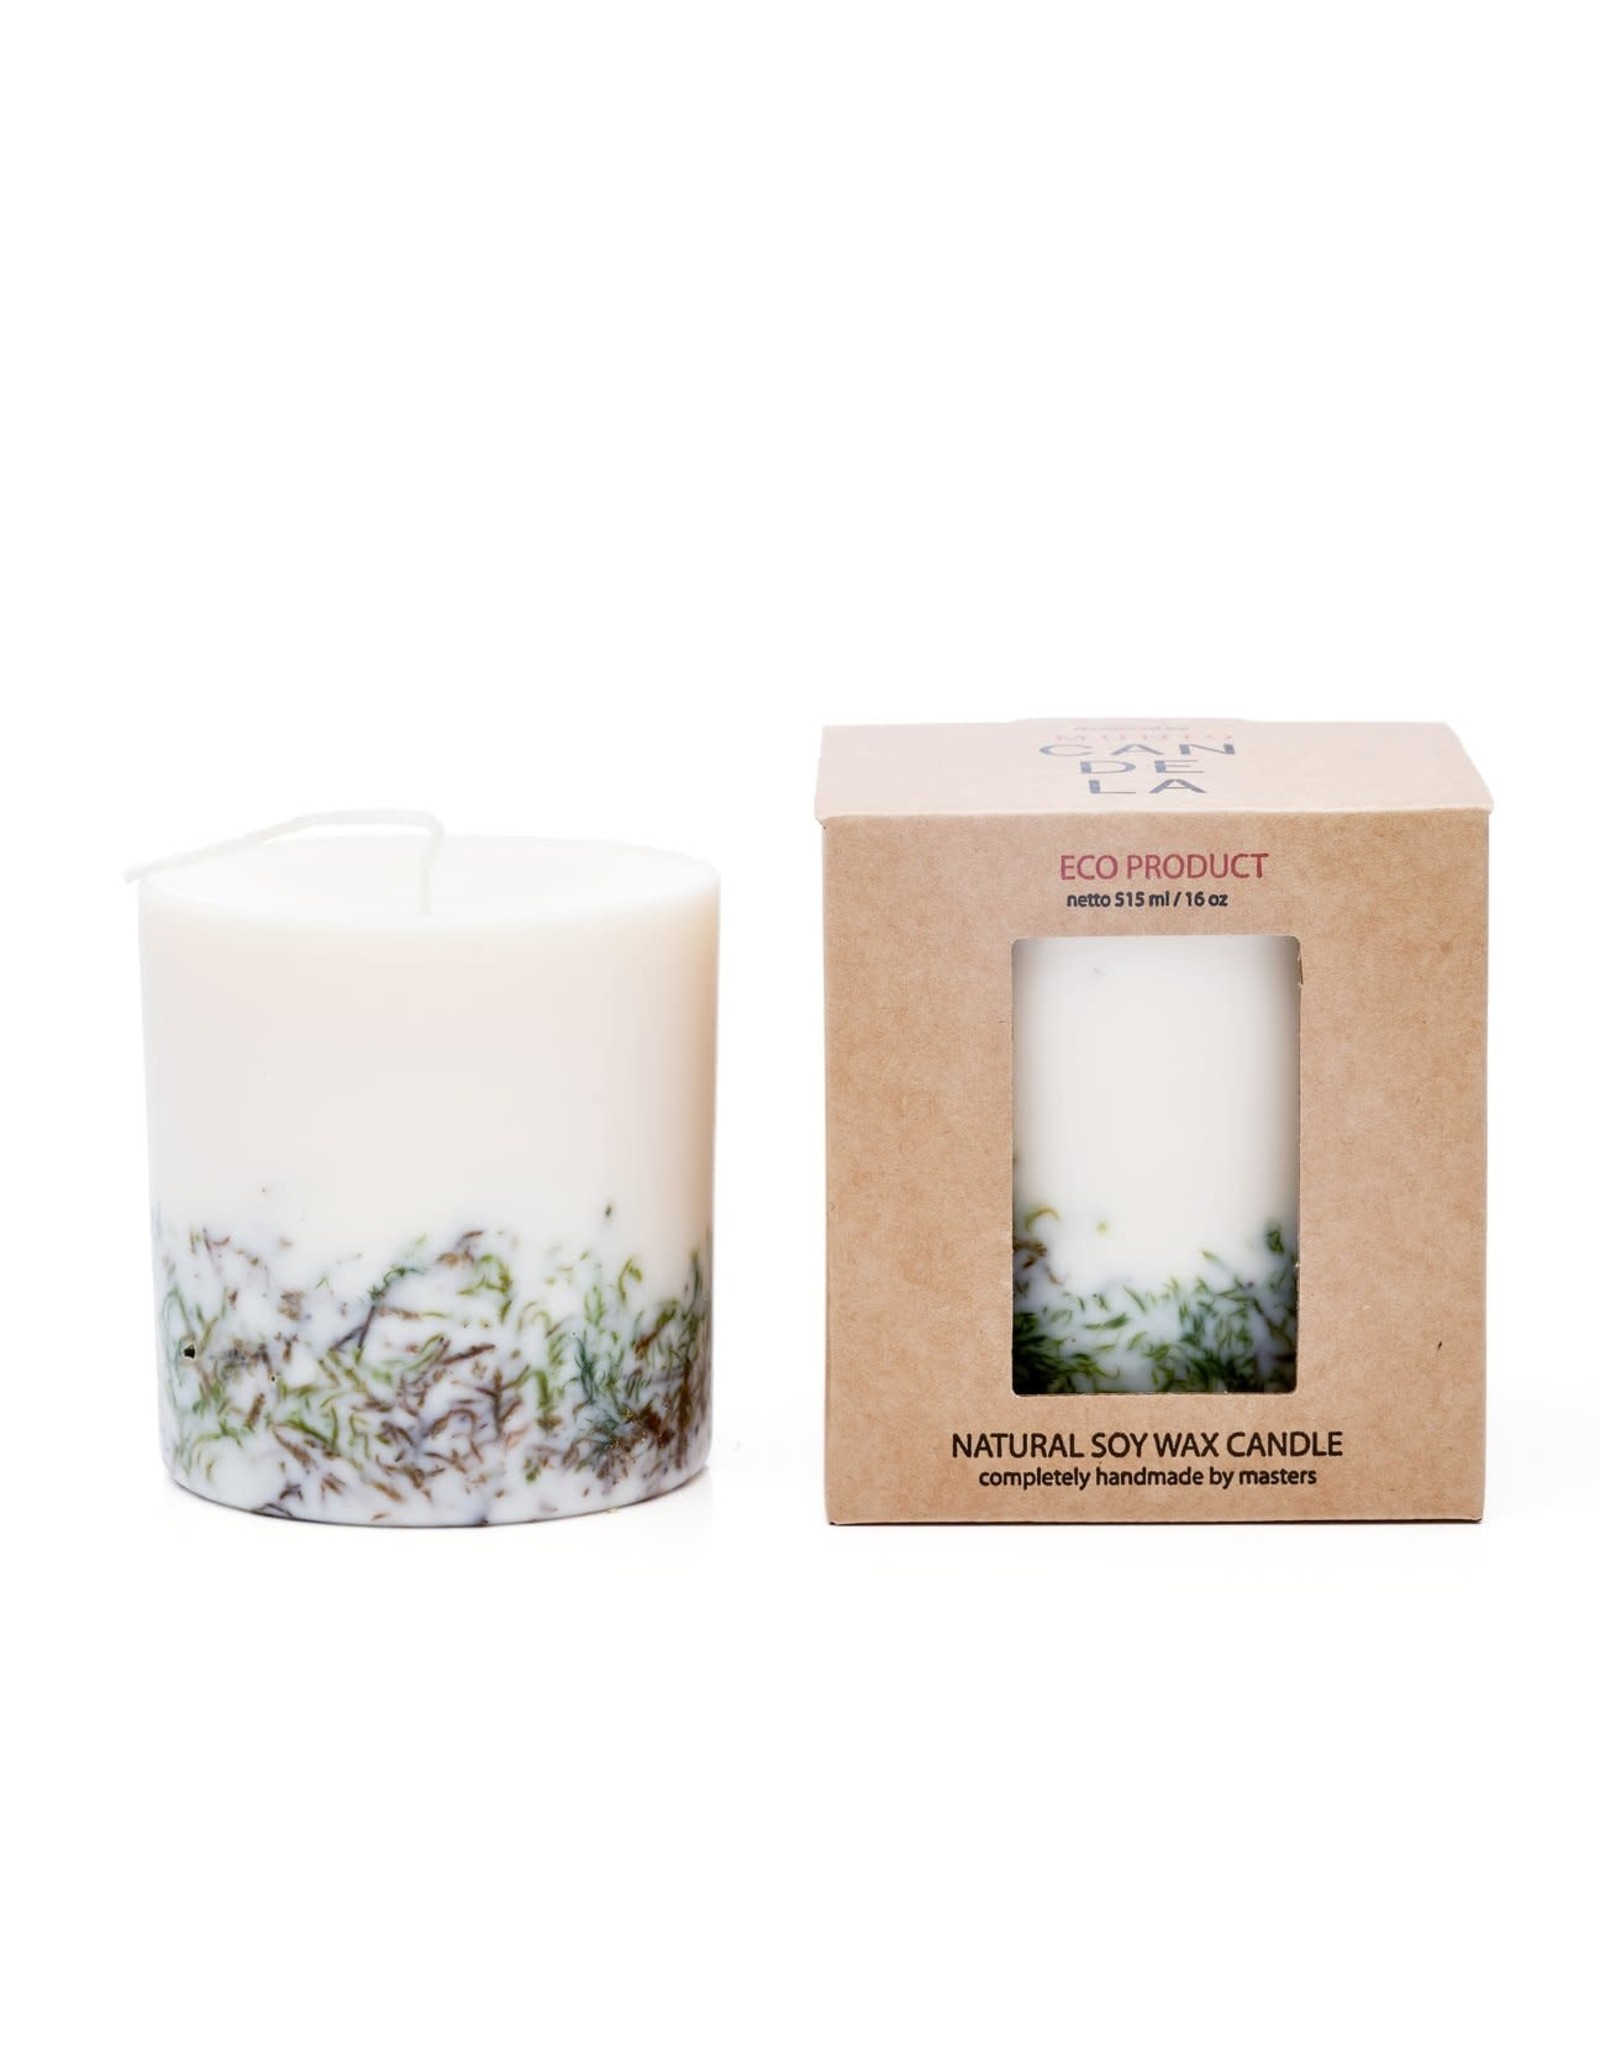 Munio Candela Kaars - Blokkaars - Moss - Natural Soy Wax - 515ml - Dia 8cm x H 10cm - Burn Time 50h